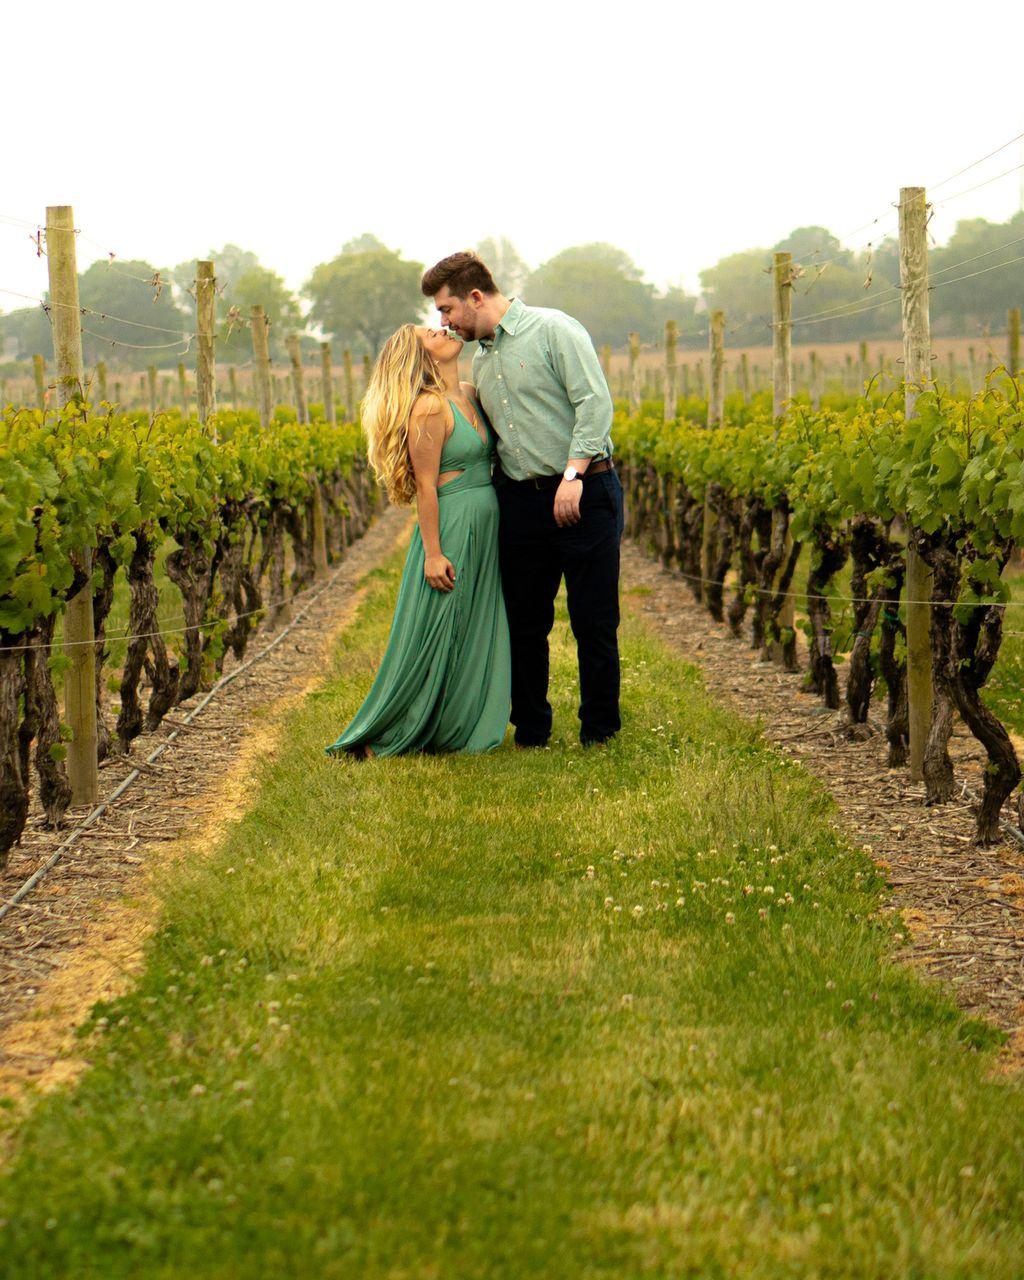 Engagement at the Vineyard